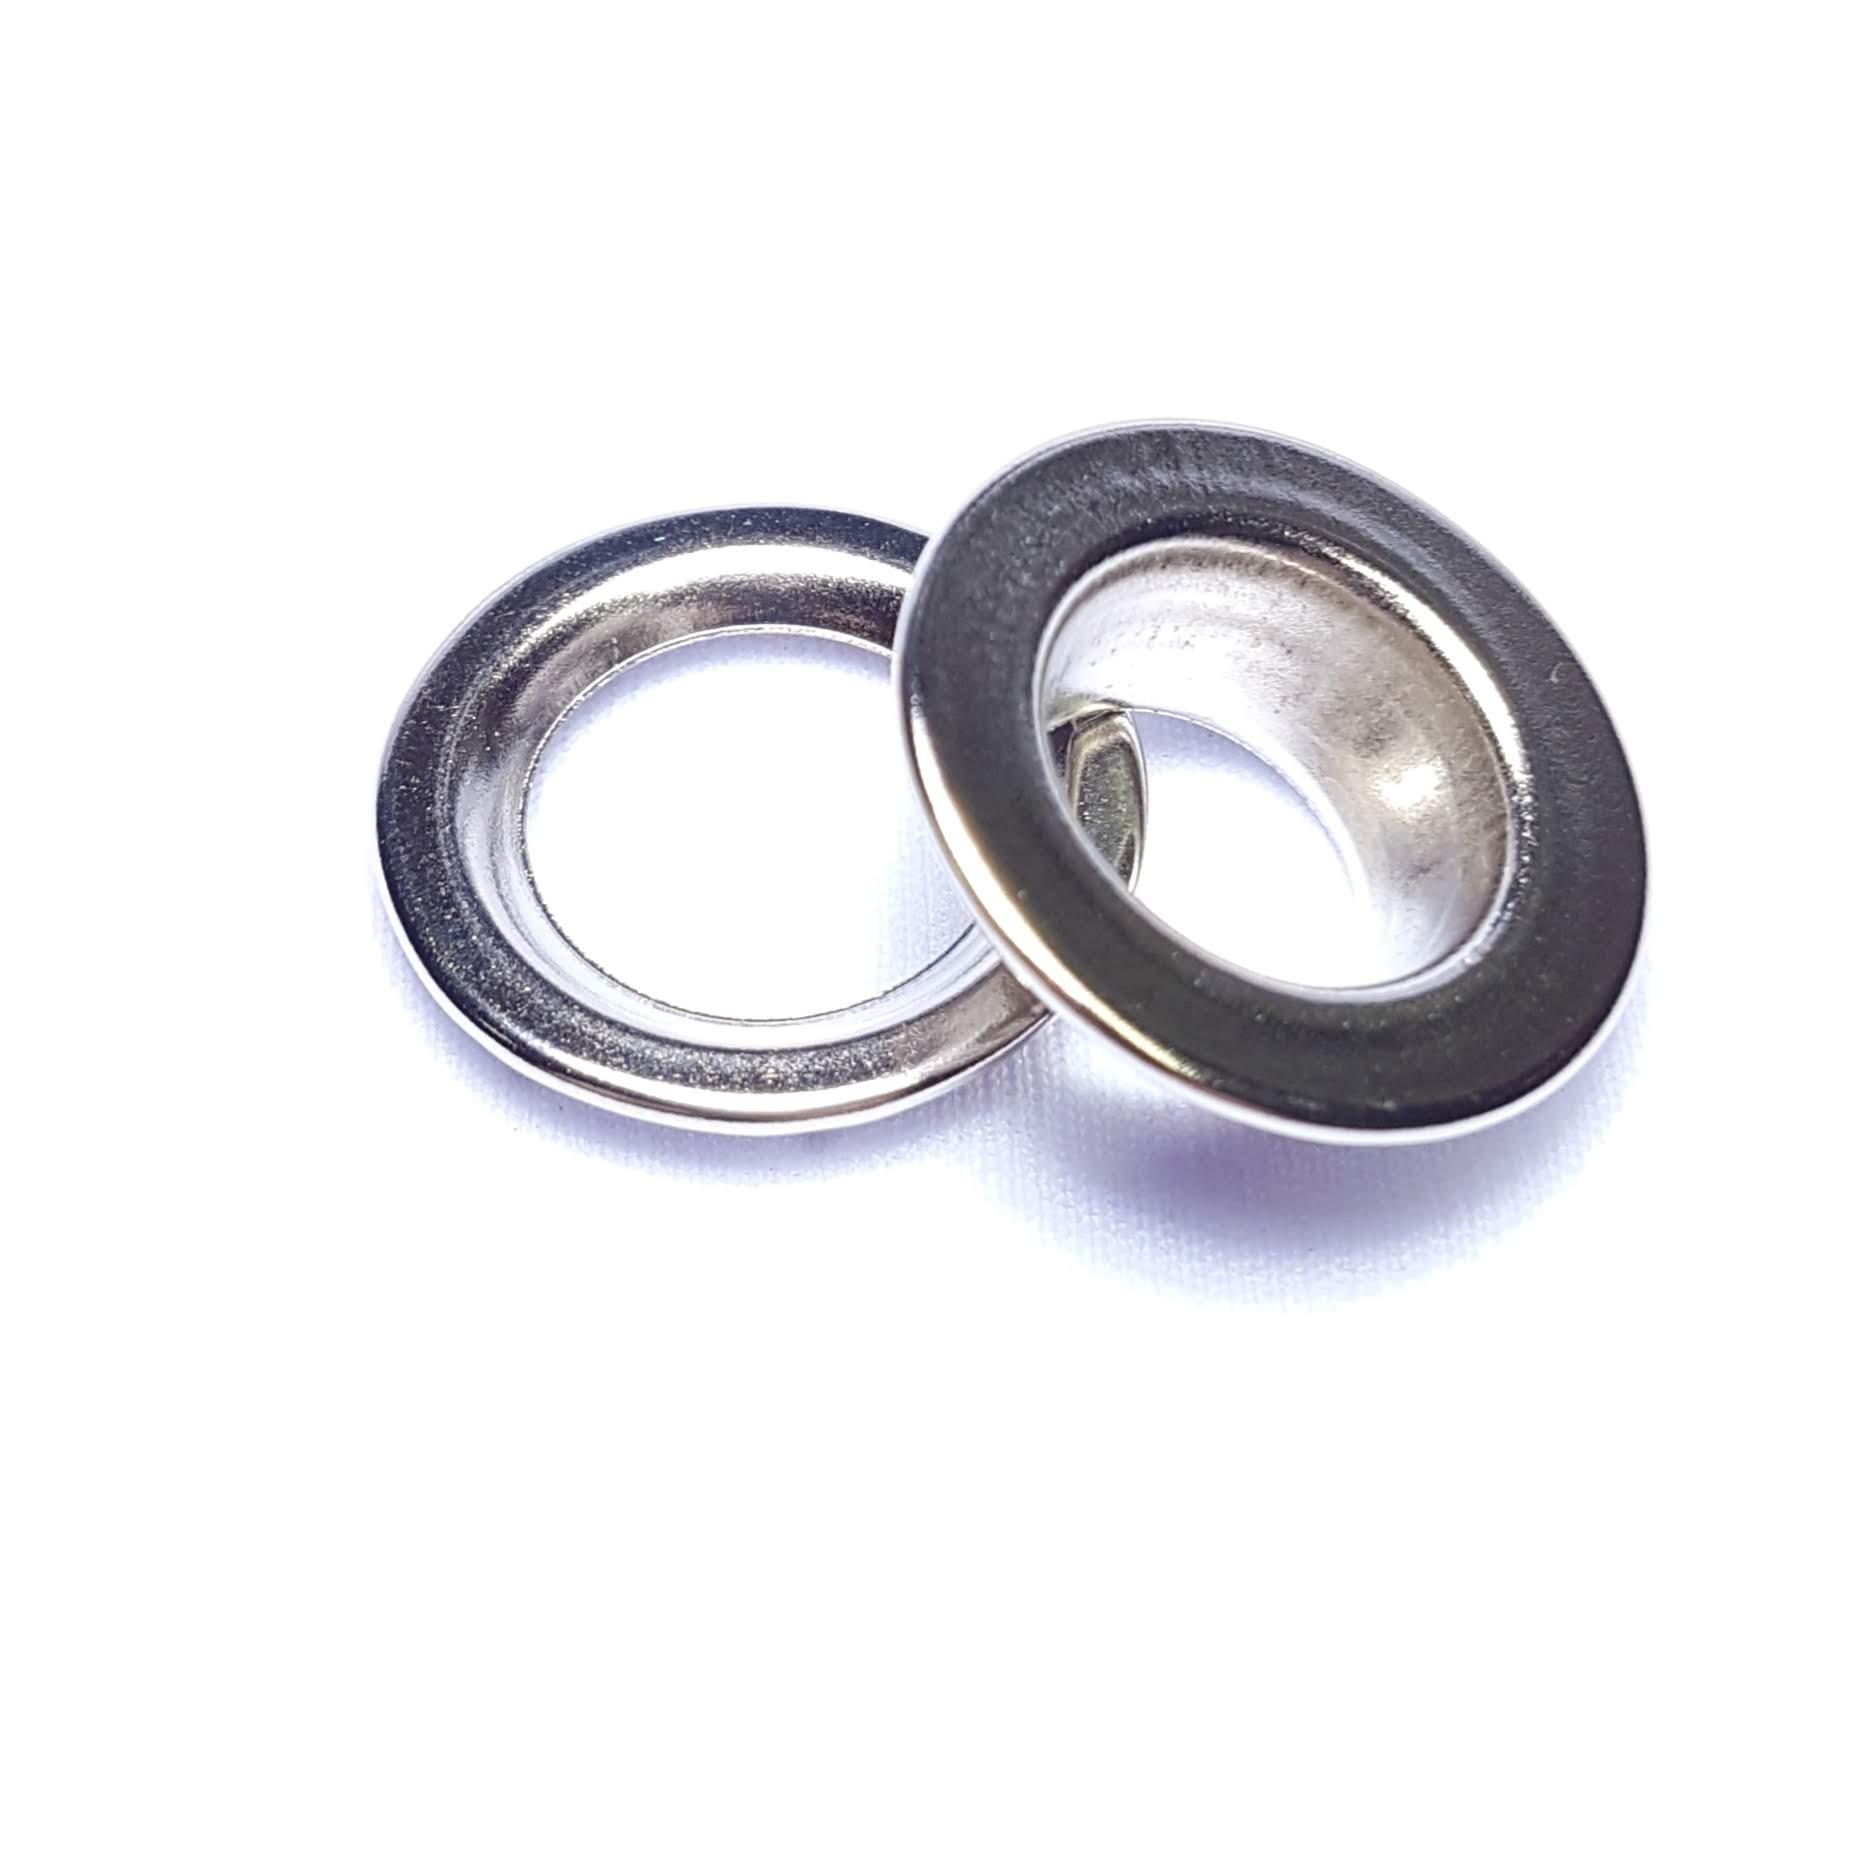 Ilhós de ferro arruela com garra n.º 3 - Niquelado - Pcte c/ 10 unid